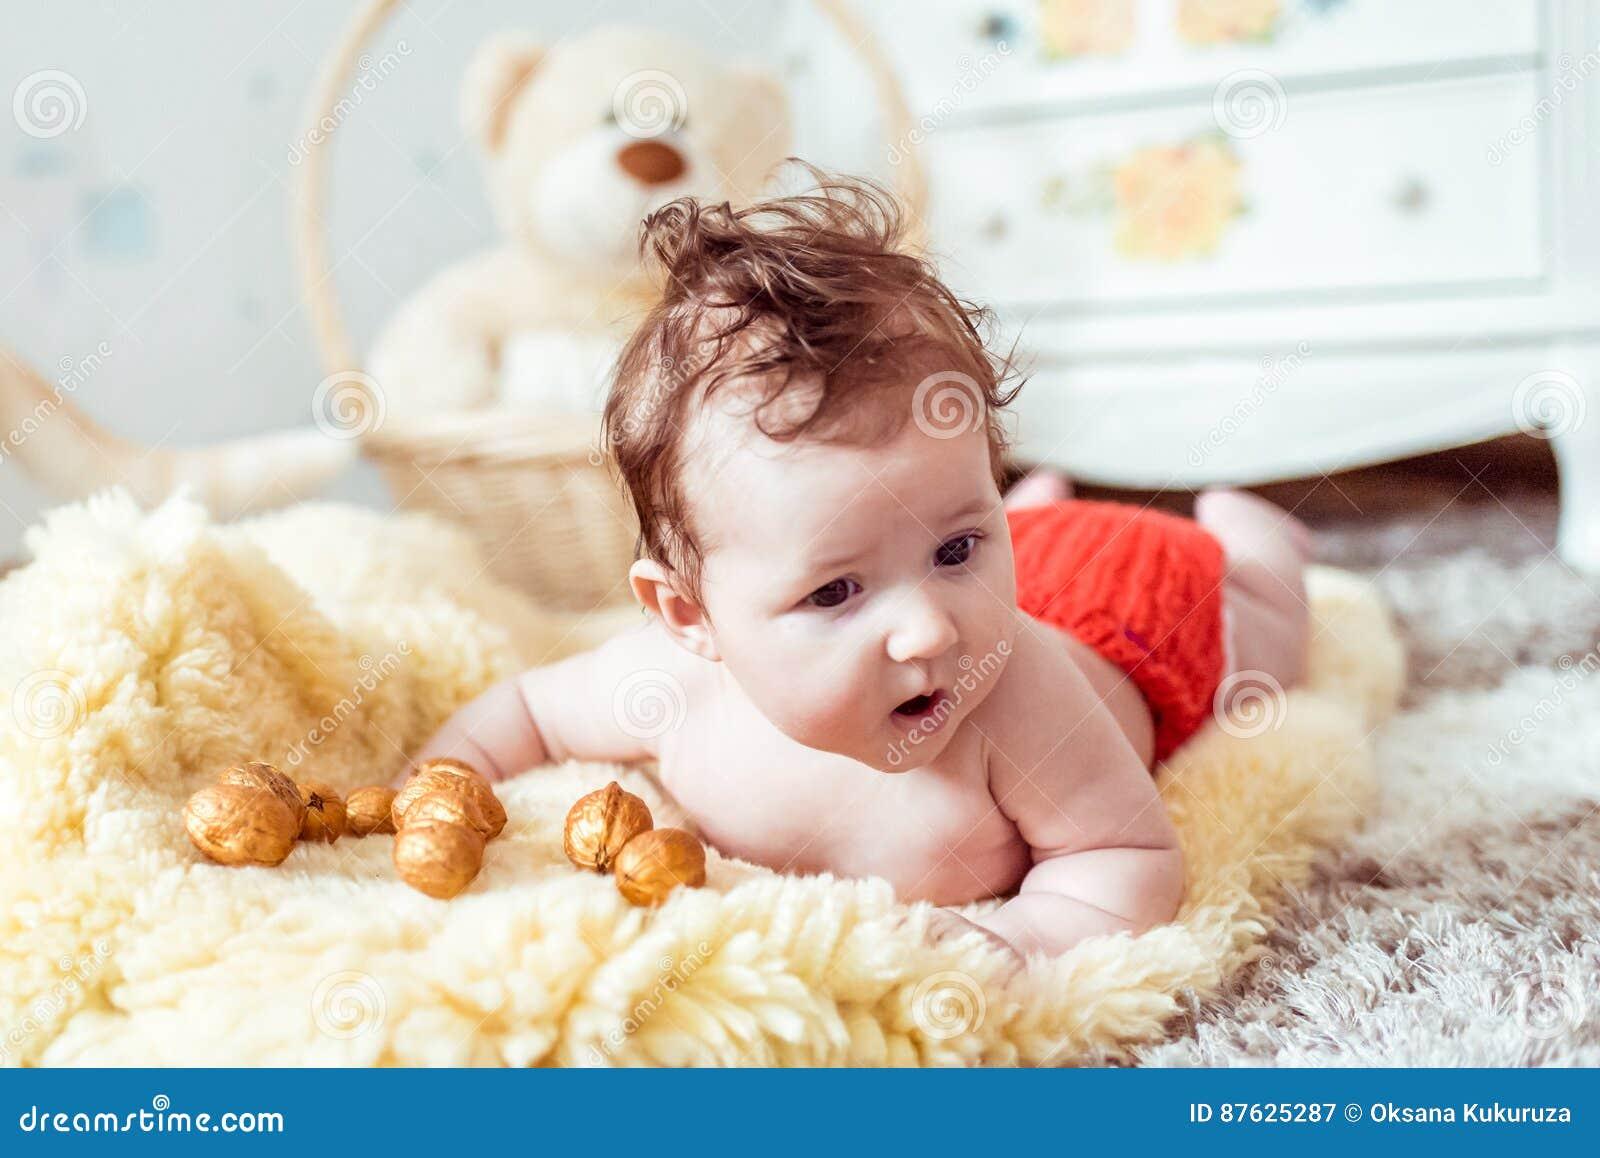 Naked Baby Lying On Blanket Stock Photo - Image of healthy